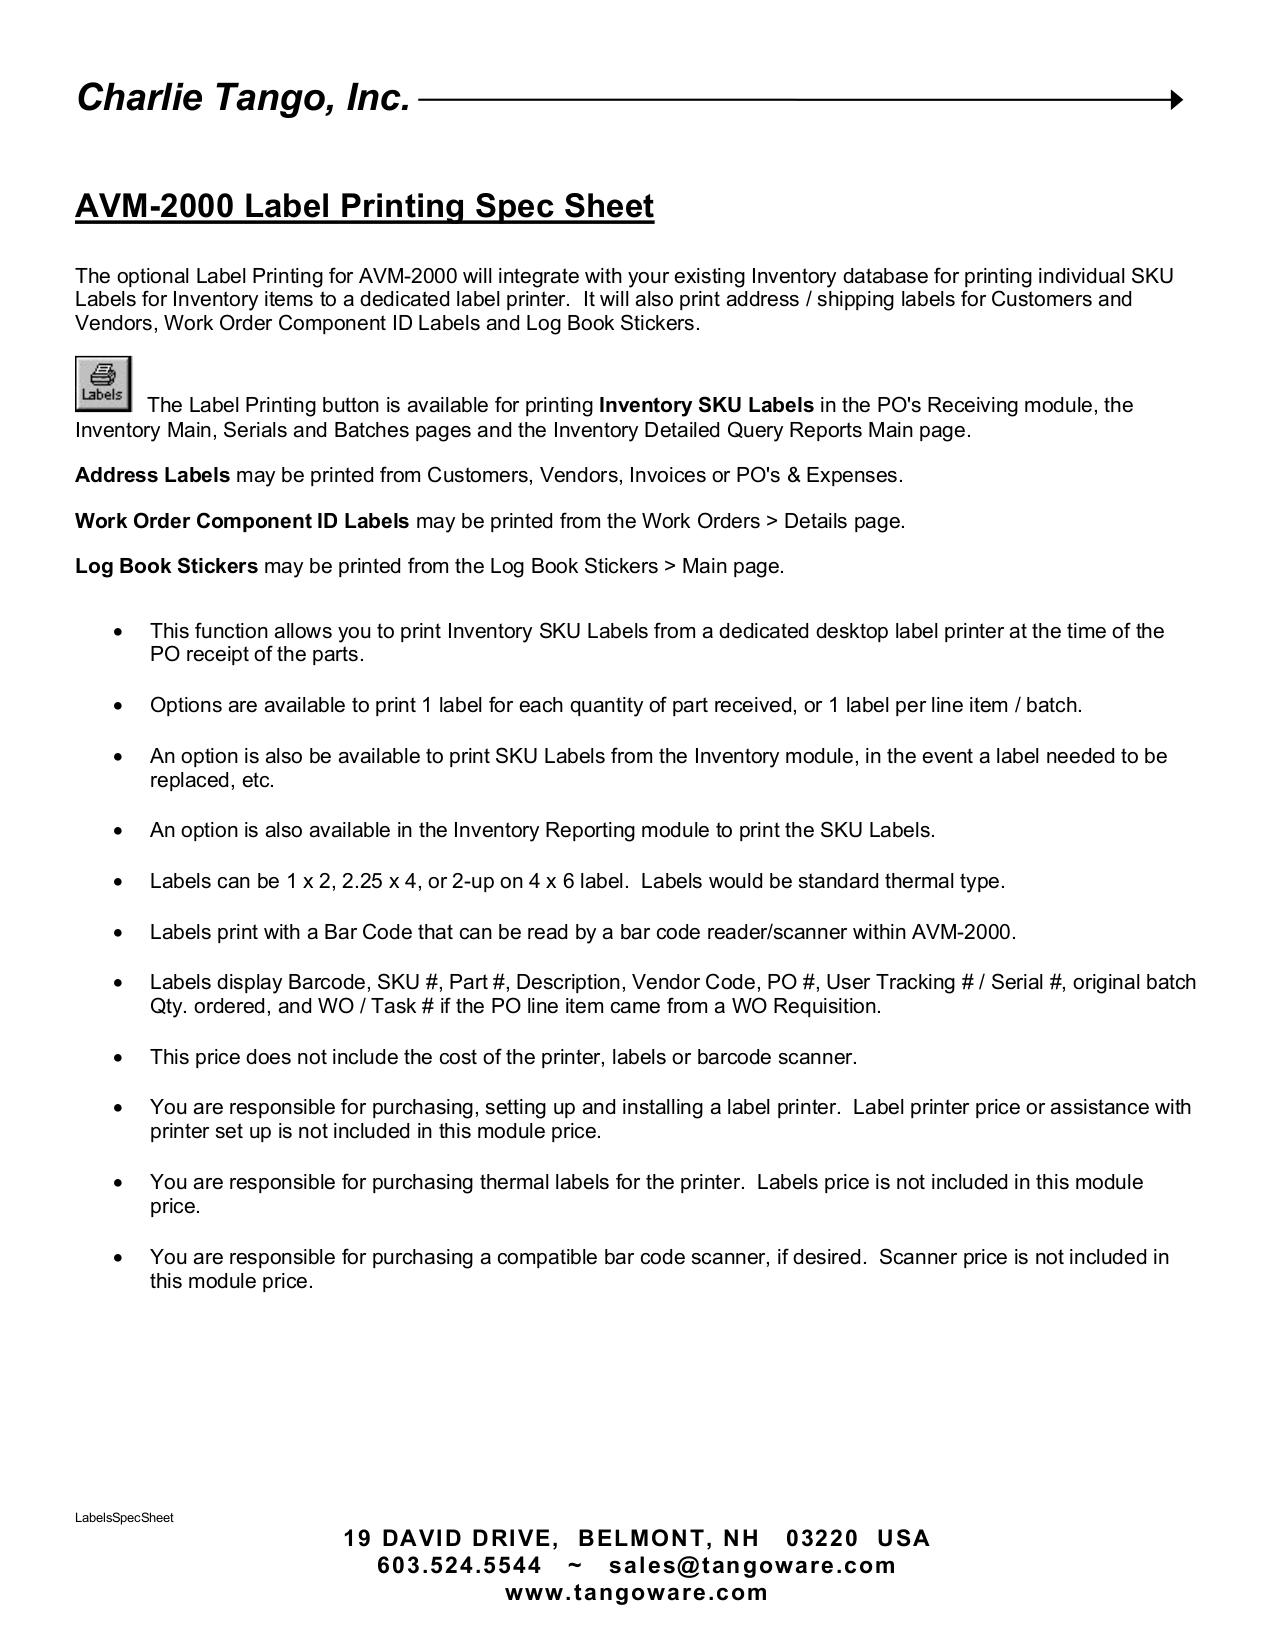 pdf for Wasp Printer WPL305 manual